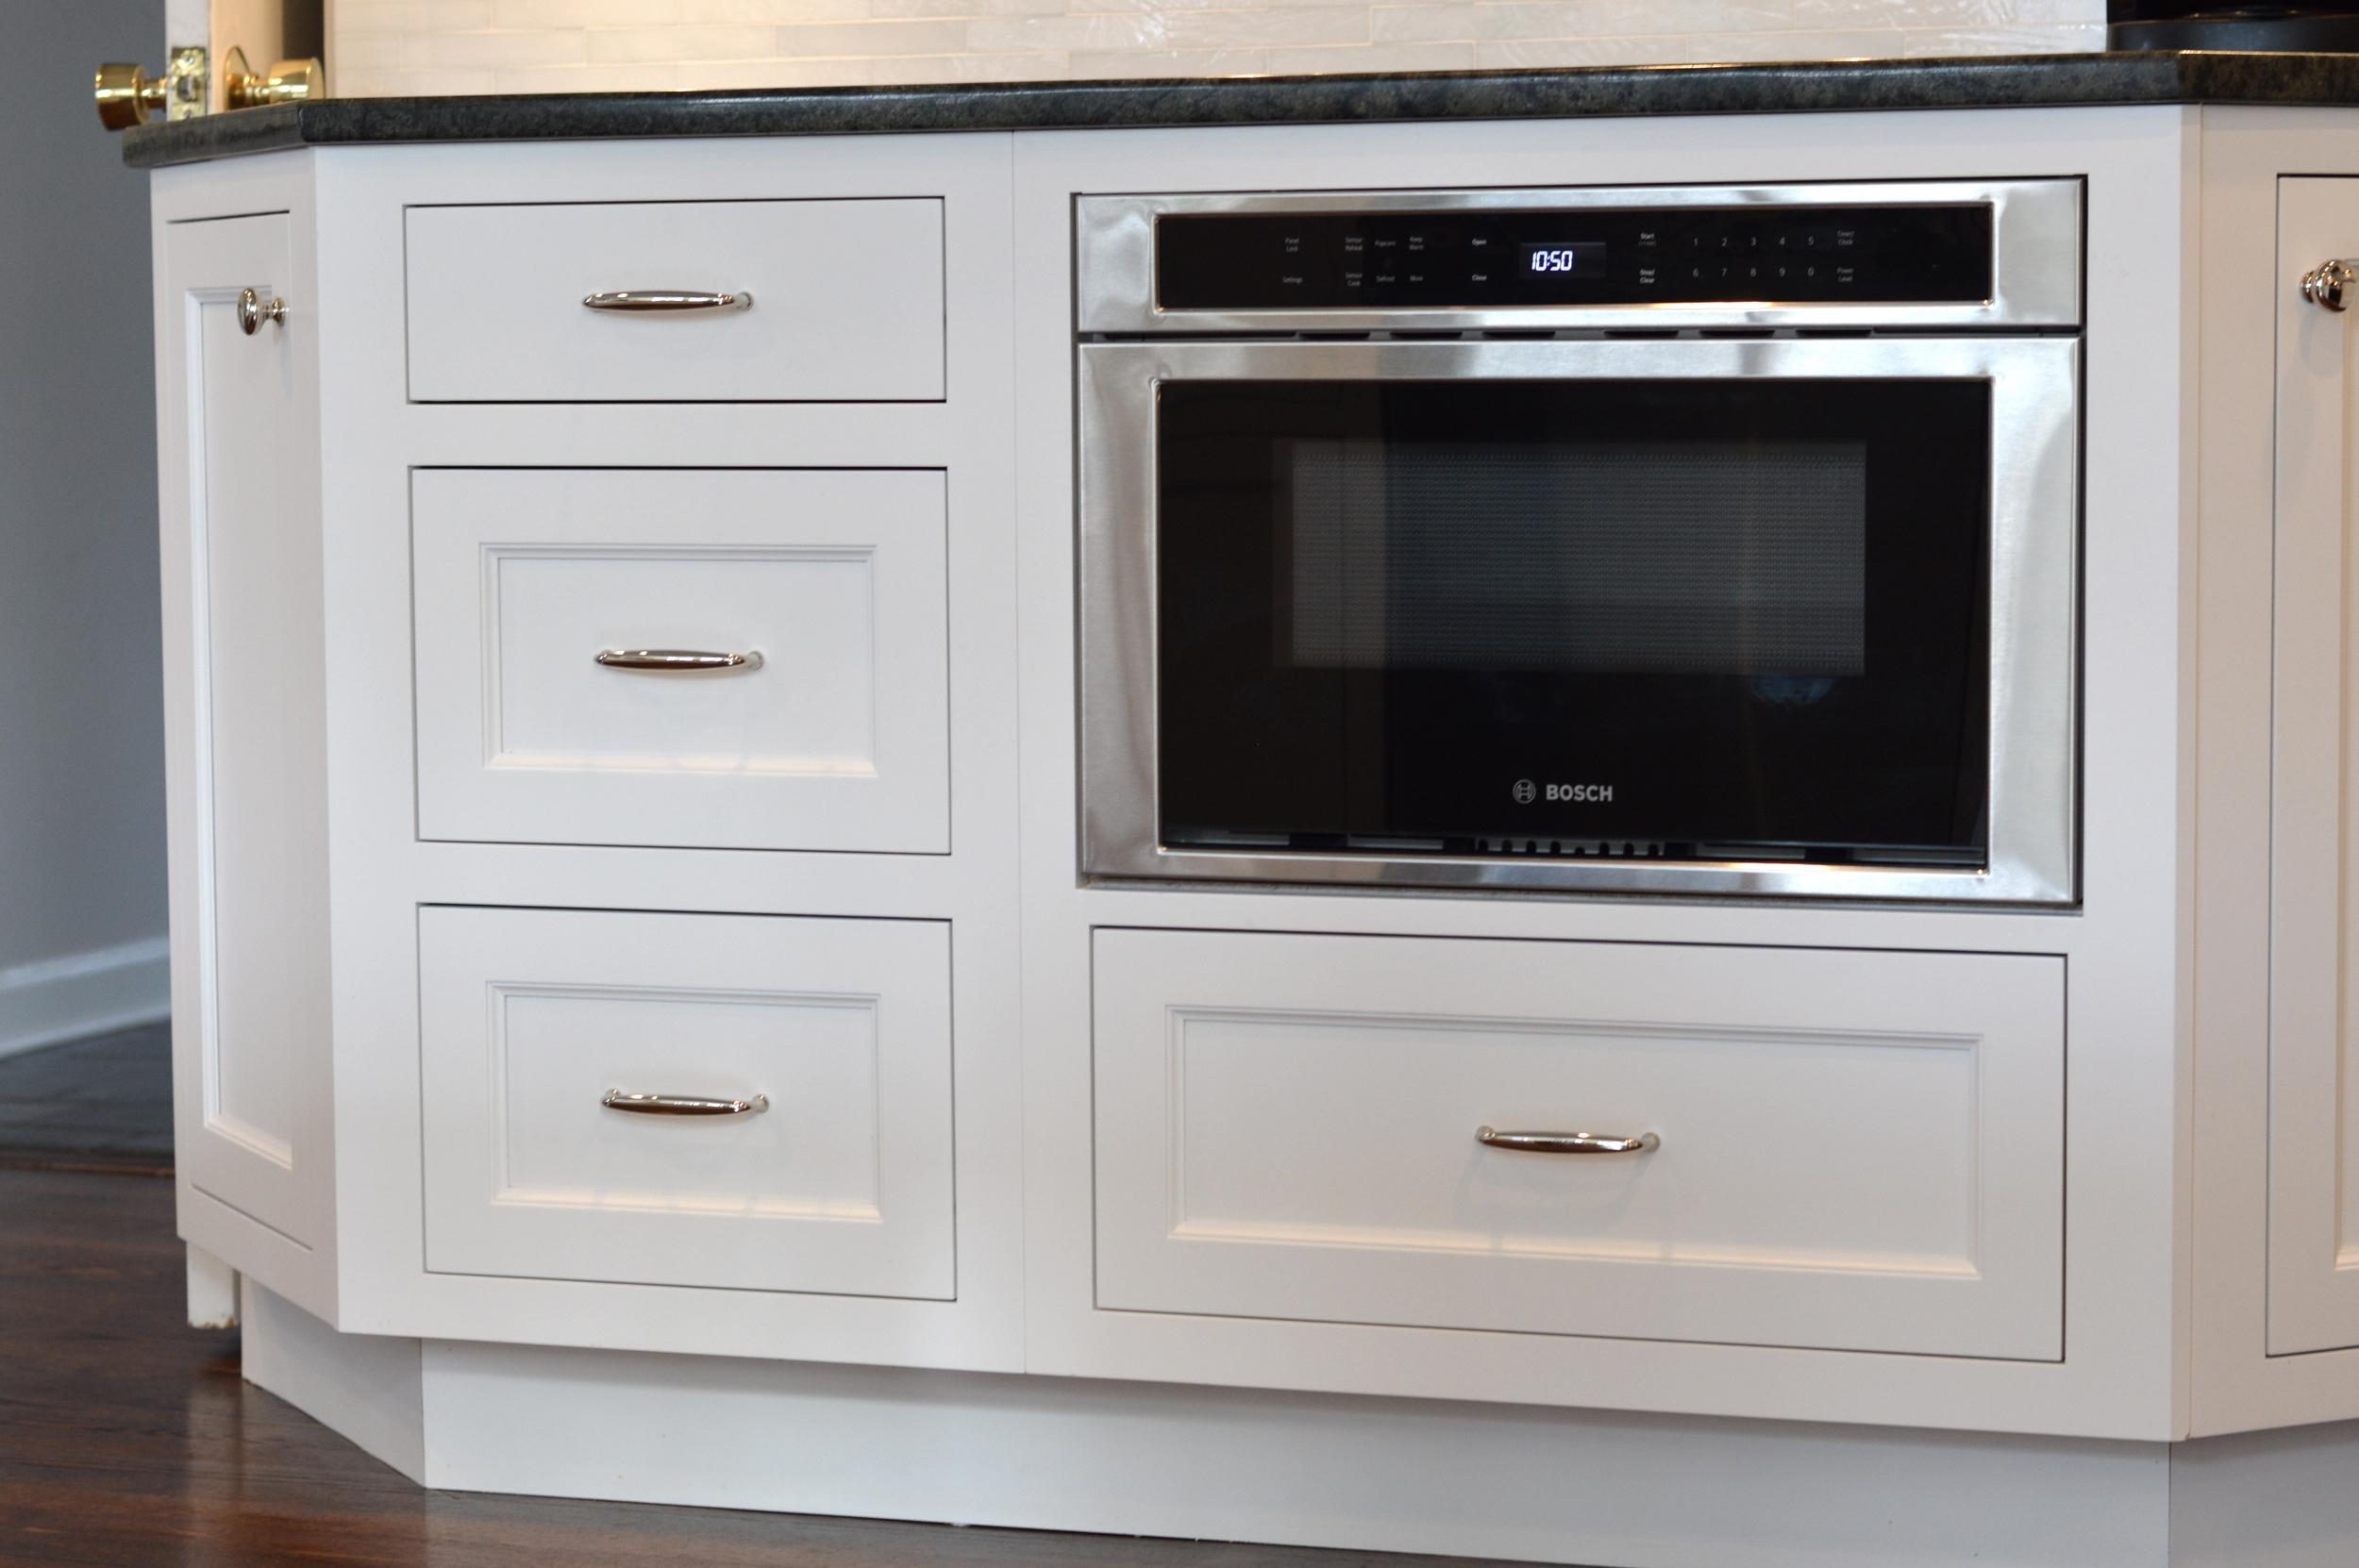 White shaker cabinet drawers